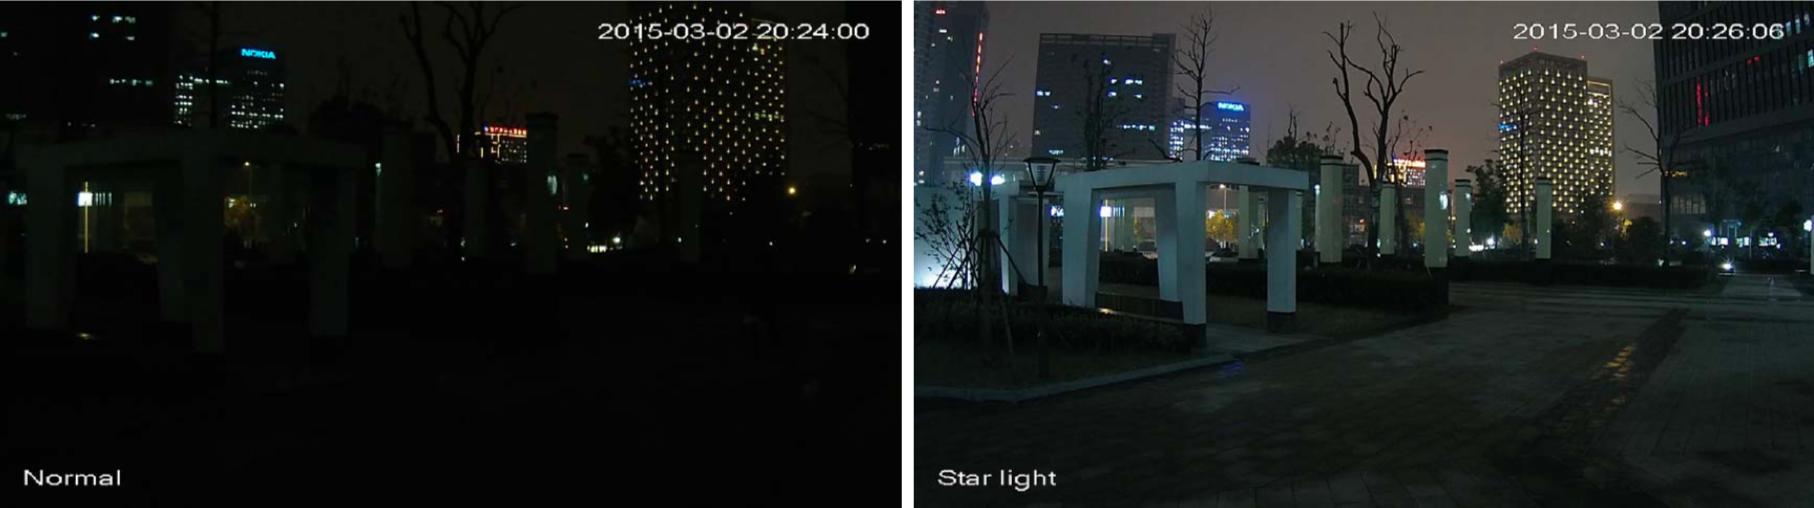 Camera surveillance HDCVI Dahua Starlight jour nuit